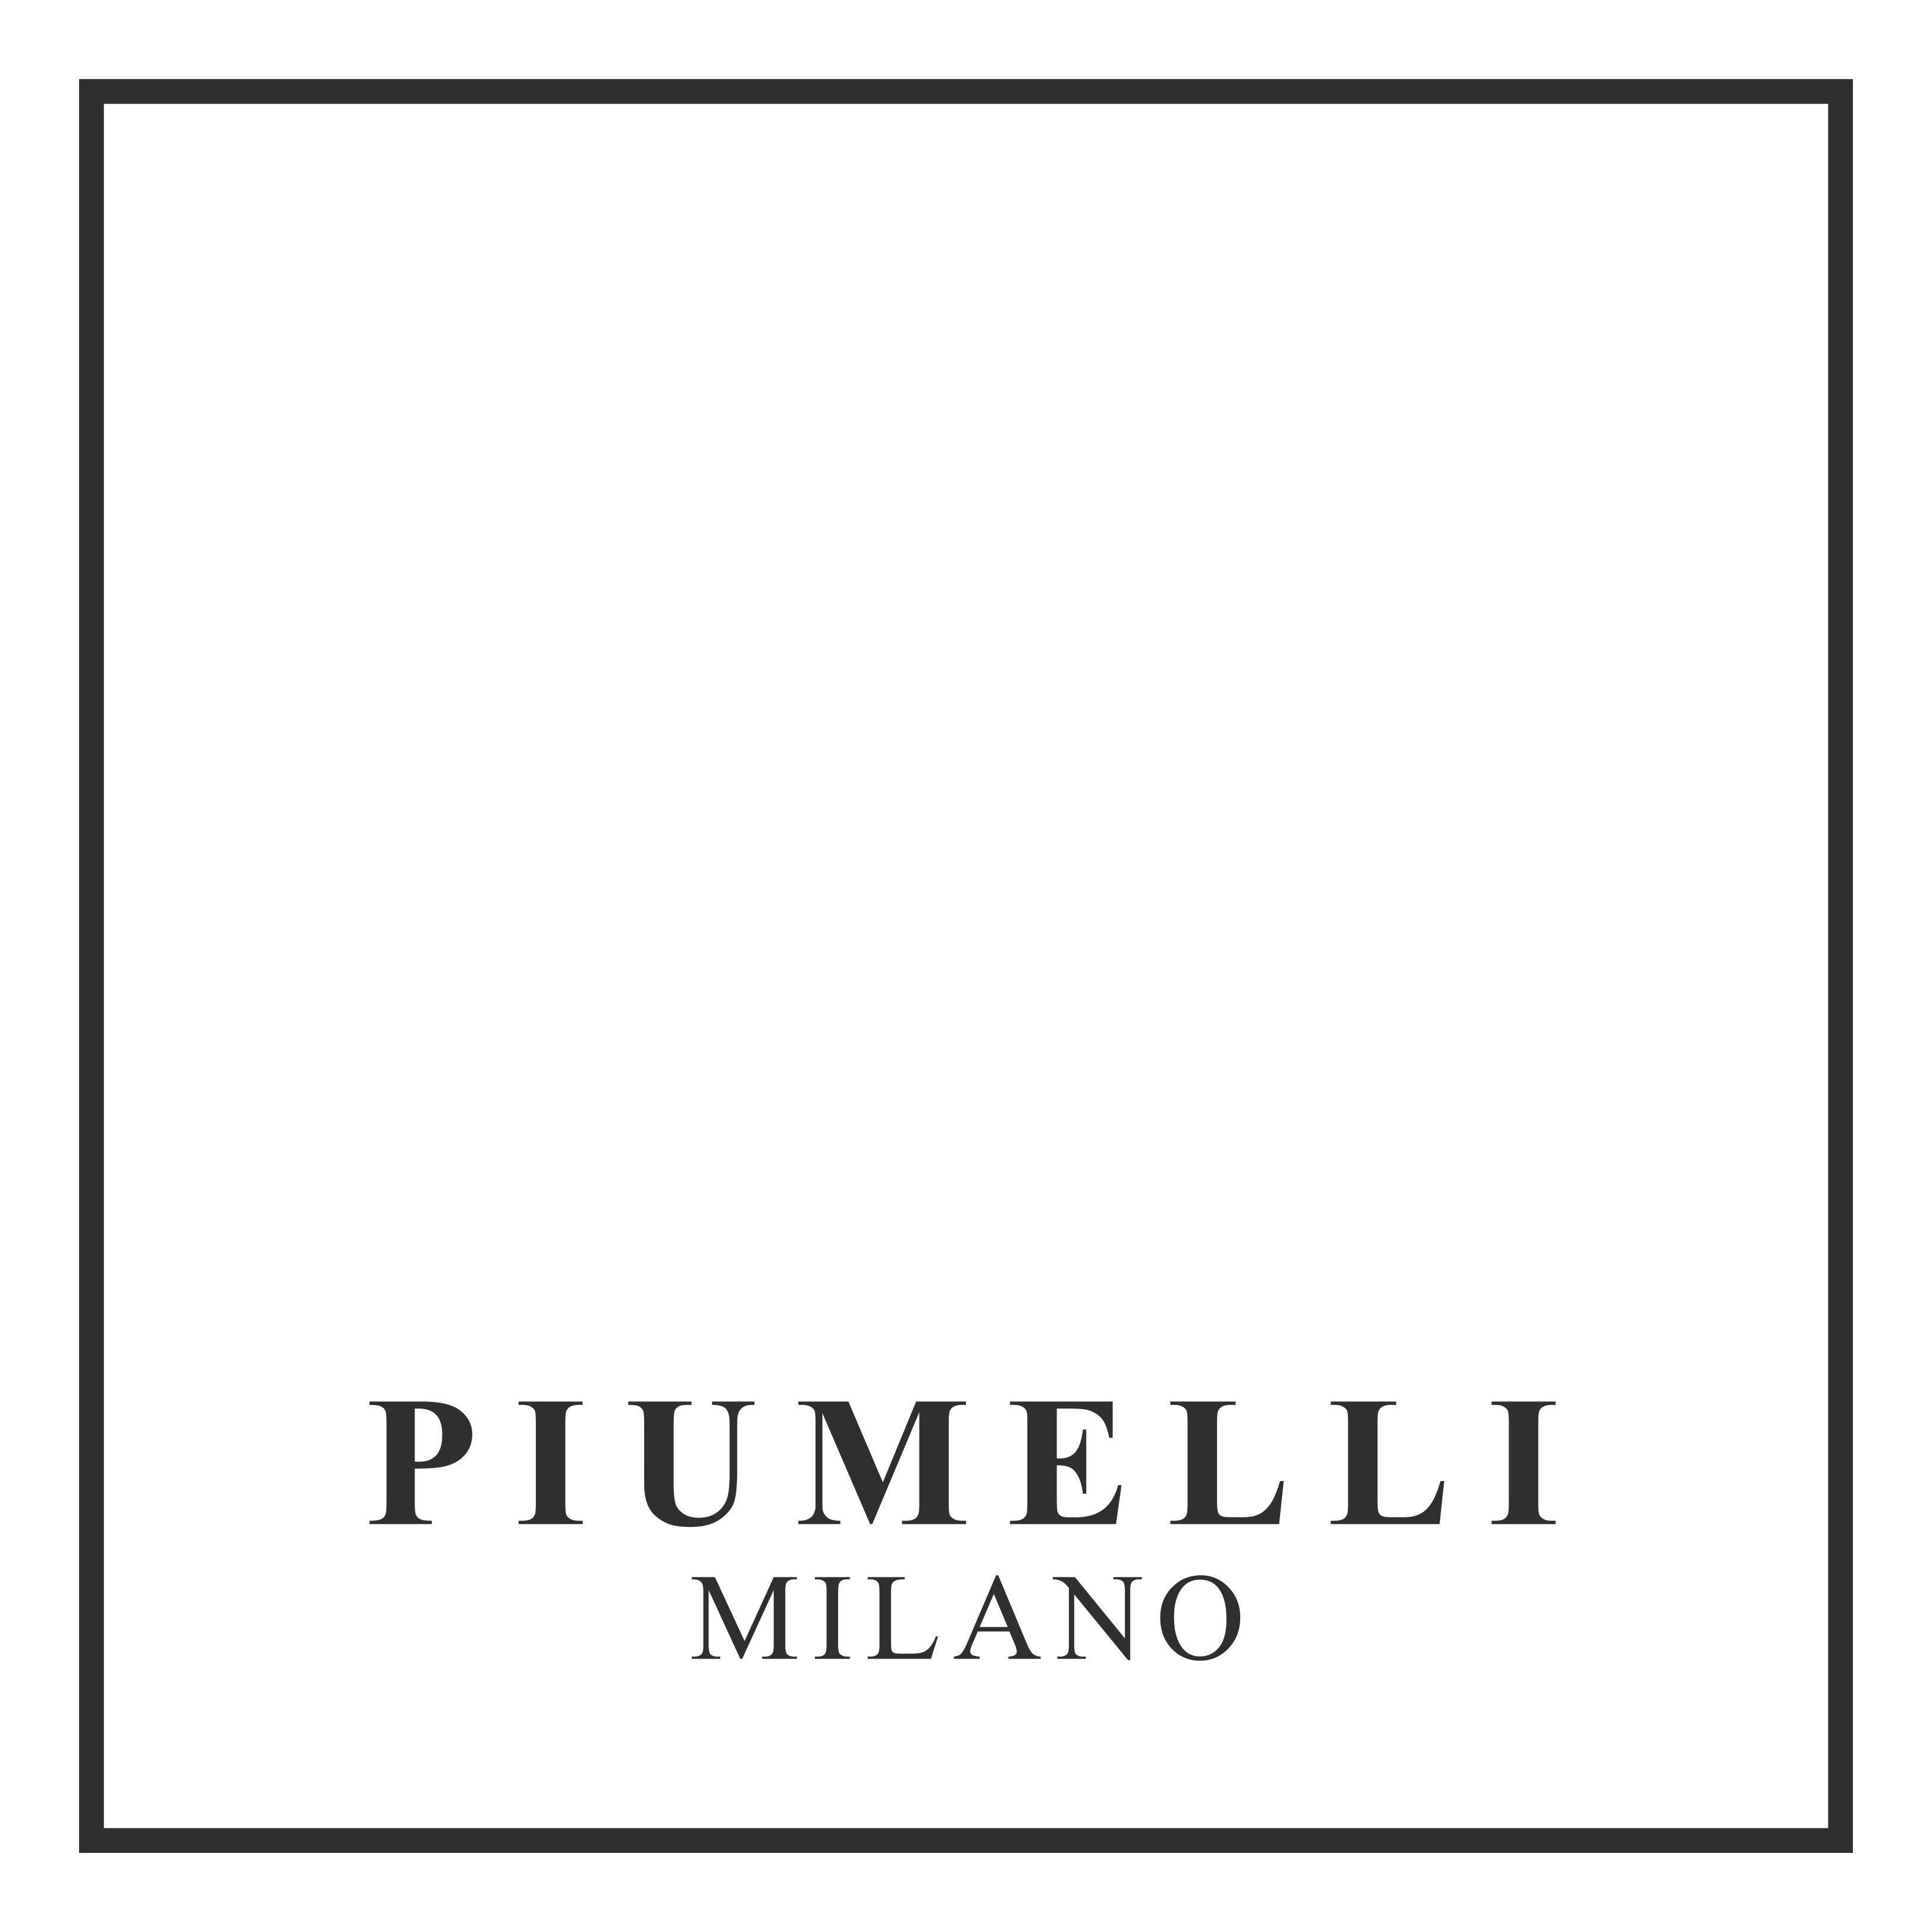 Piumelli